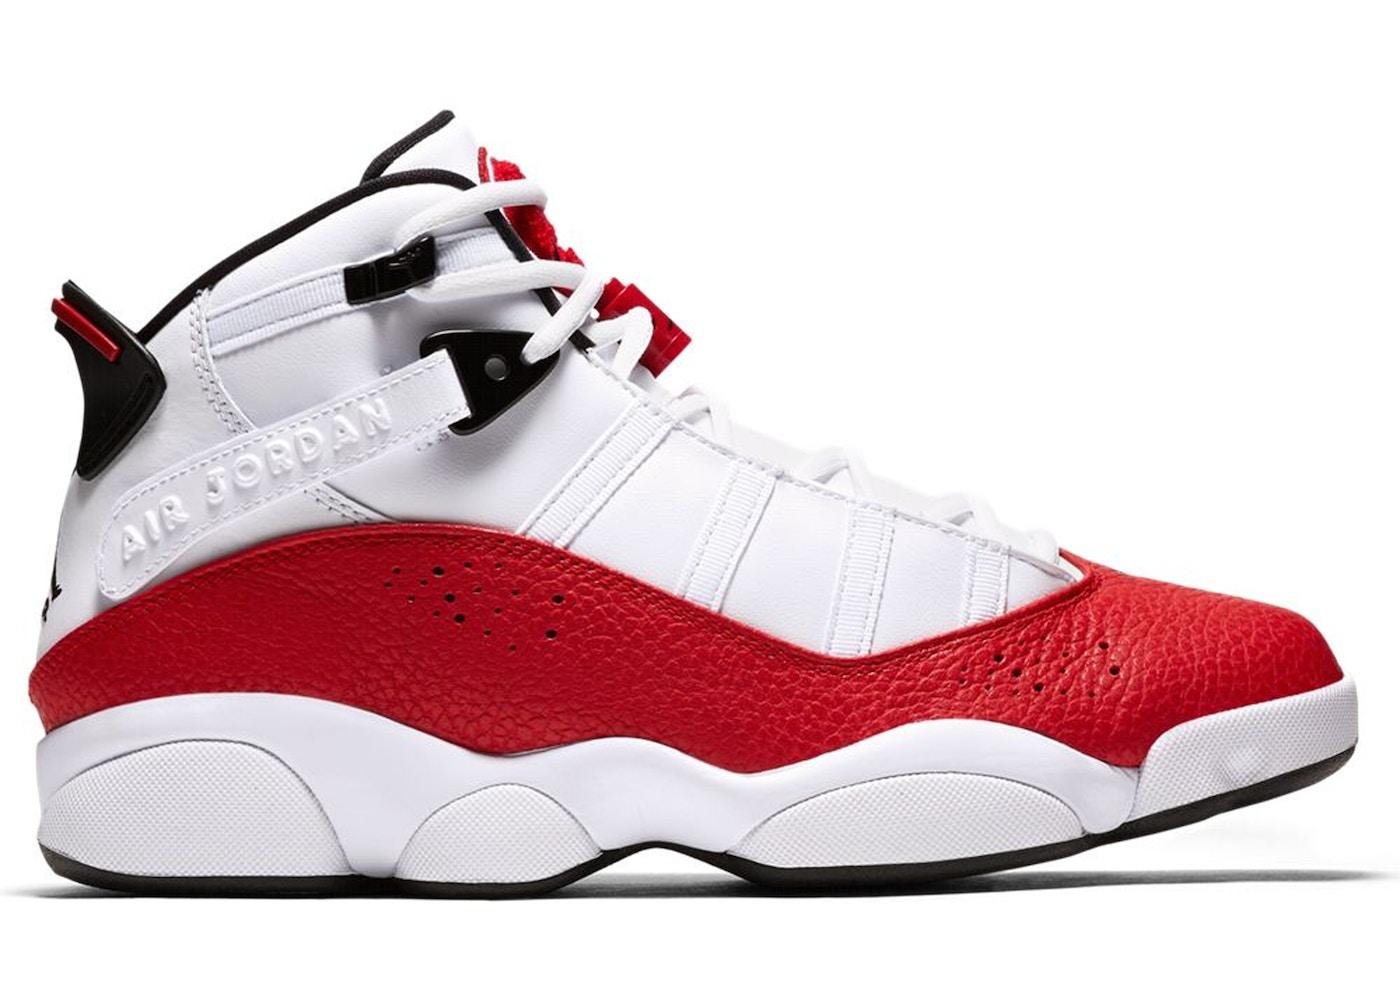 hot sale online d581f 5f221 Size  7.5. View All Bids. Jordan 6 Rings White University Red